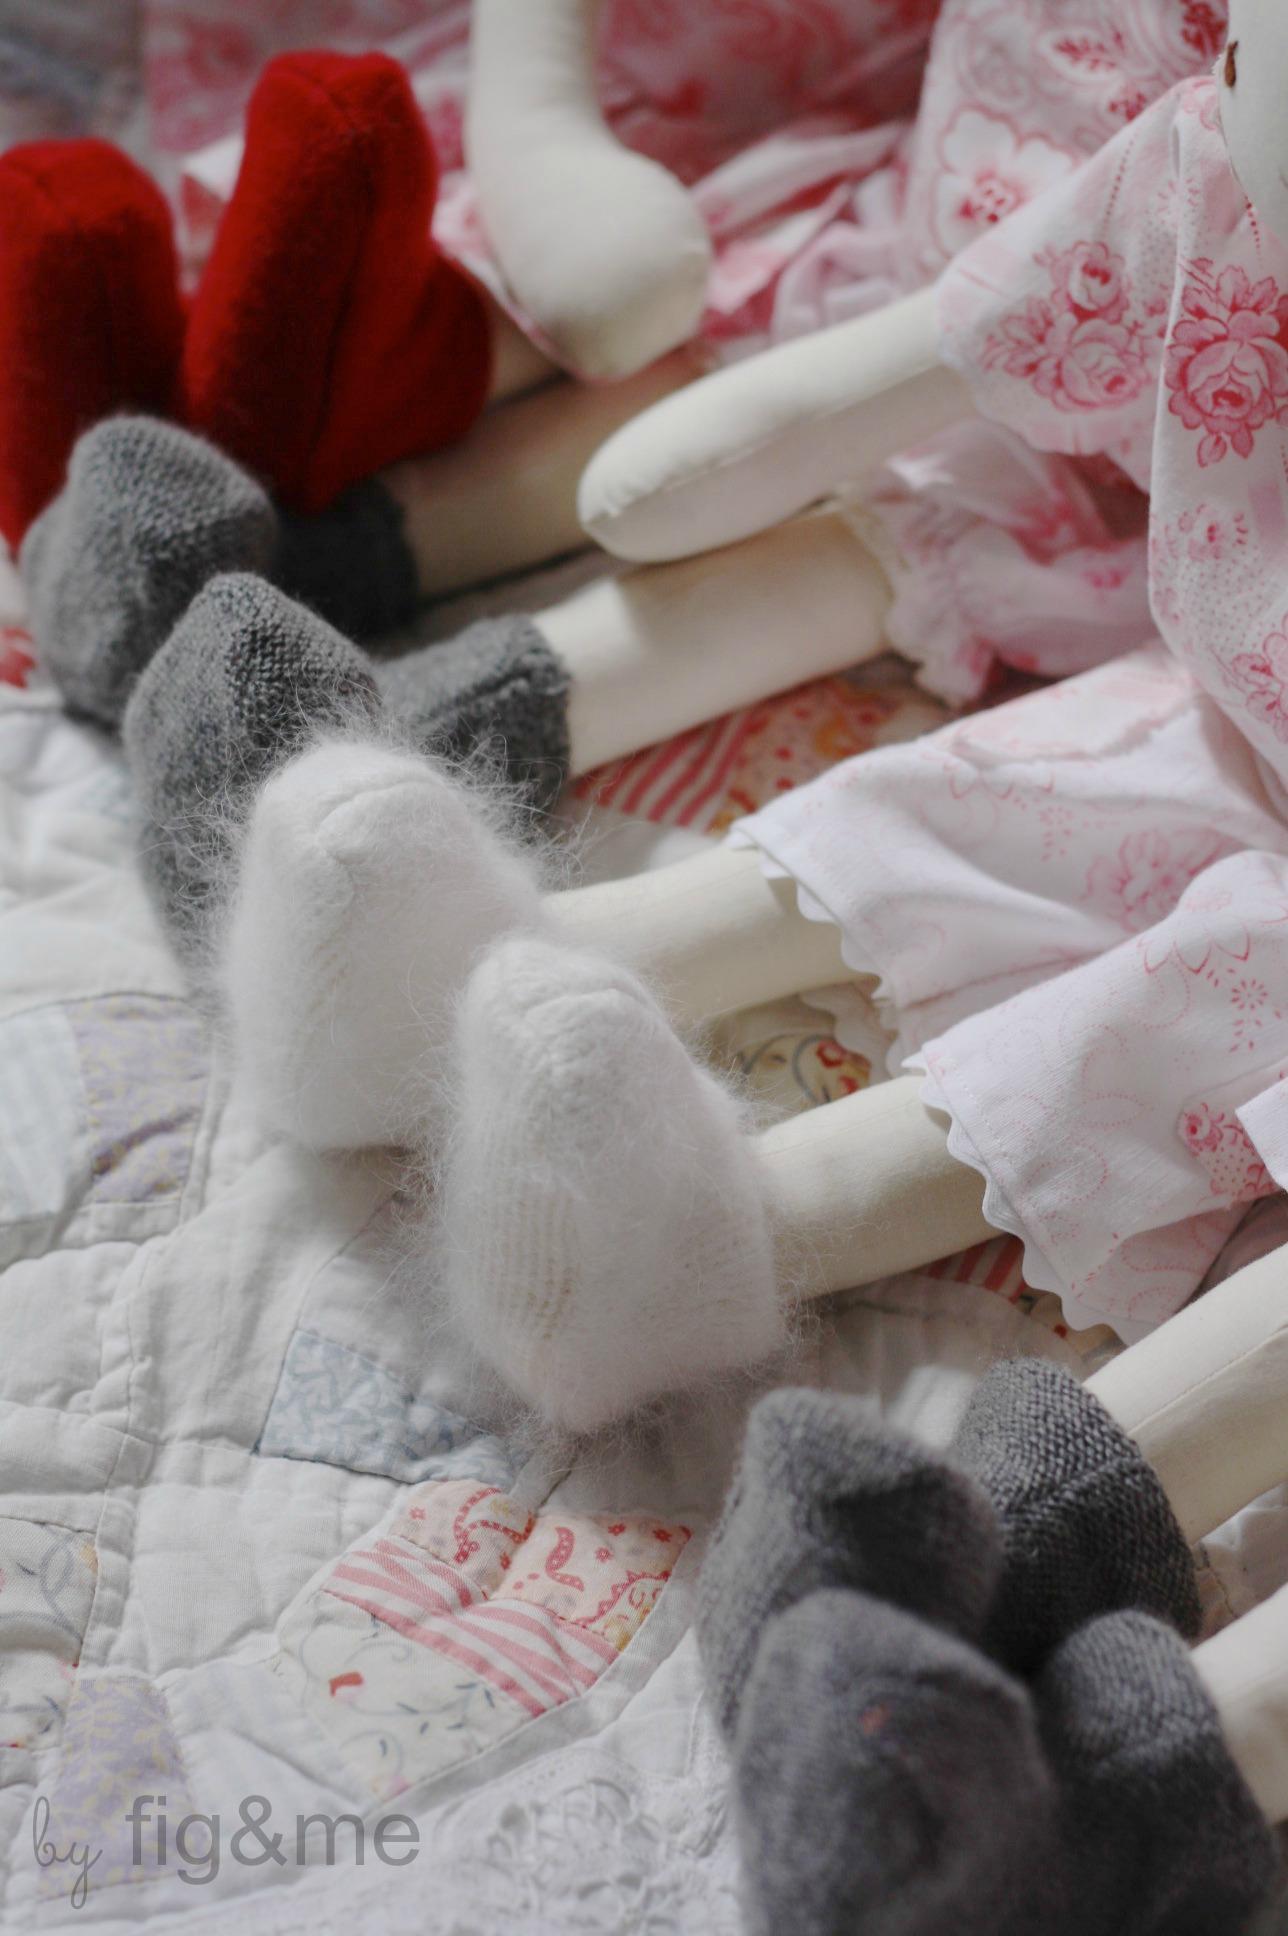 Handmade doll shoes